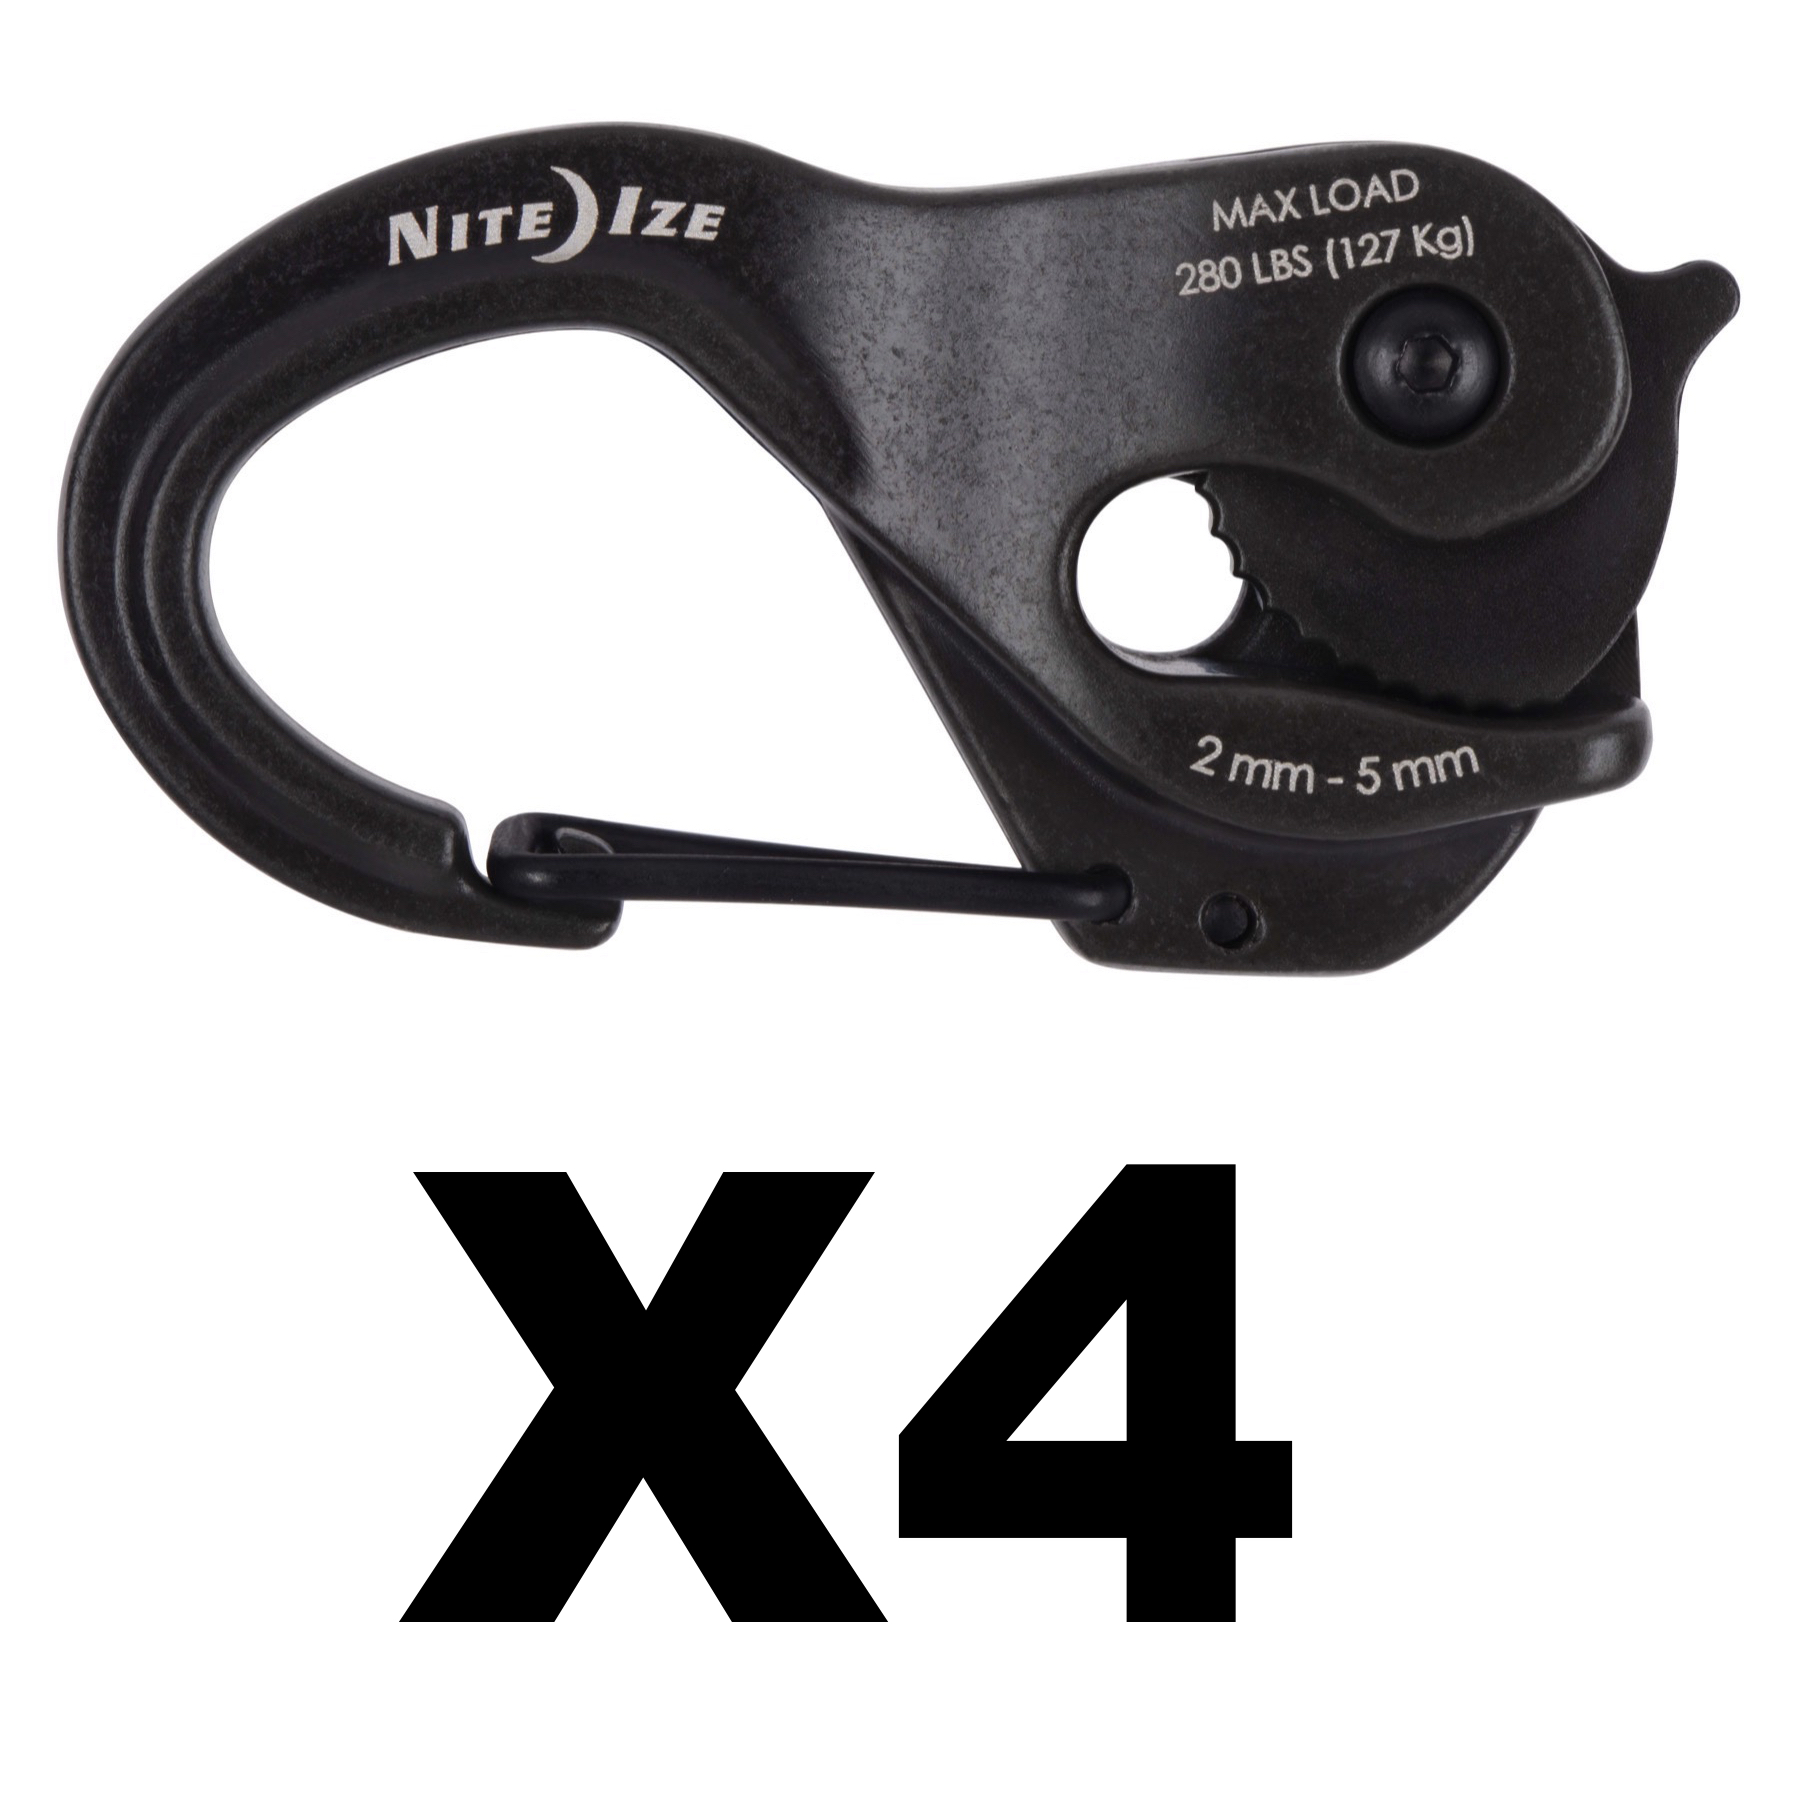 4-Pack Nite Ize CamJam XT Aluminum Rope Tightener w// Rope Heavy-Duty Rugged